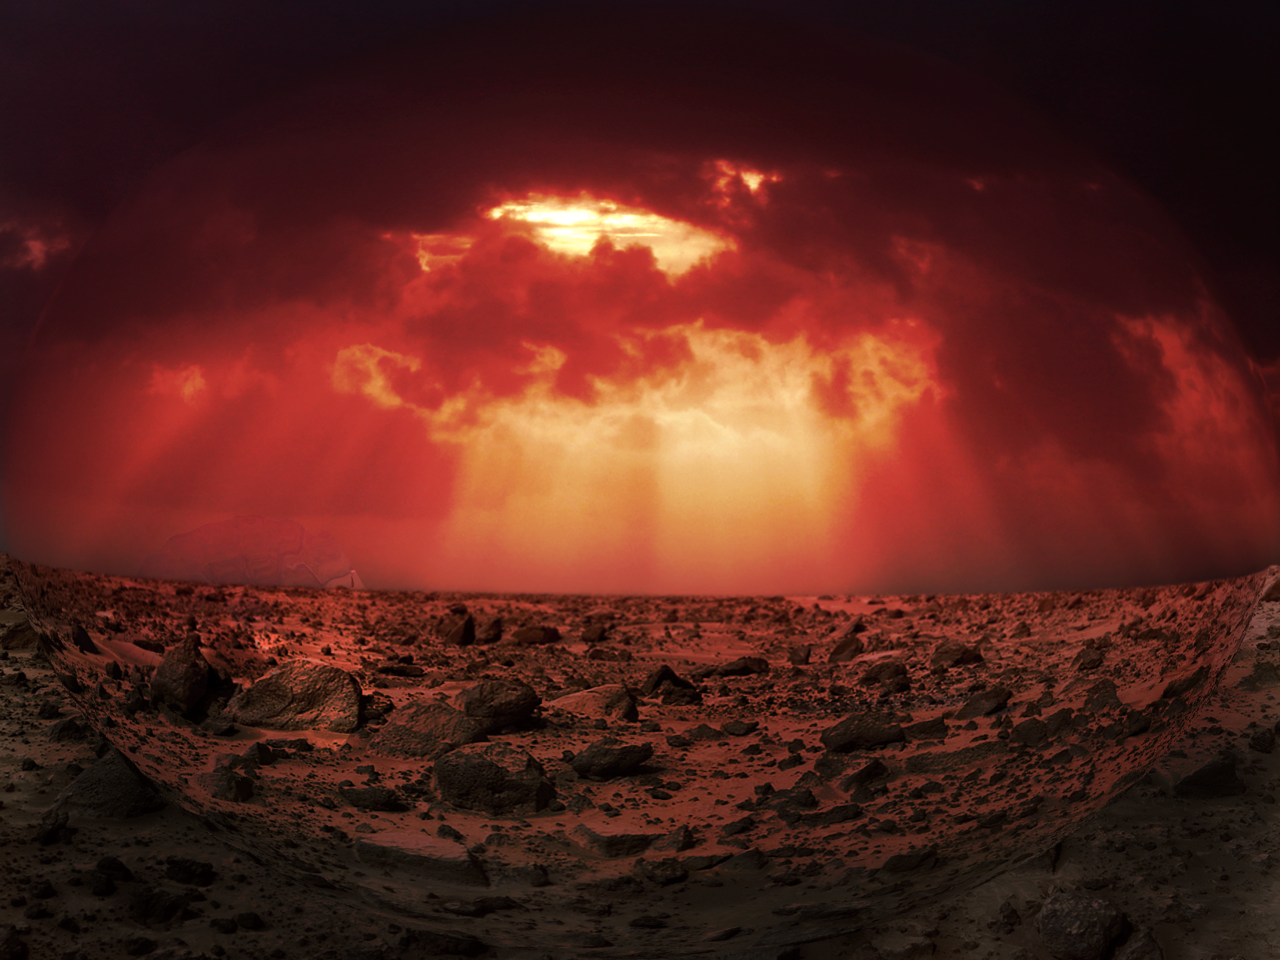 Mars_Sunset_by_DrmCtchr